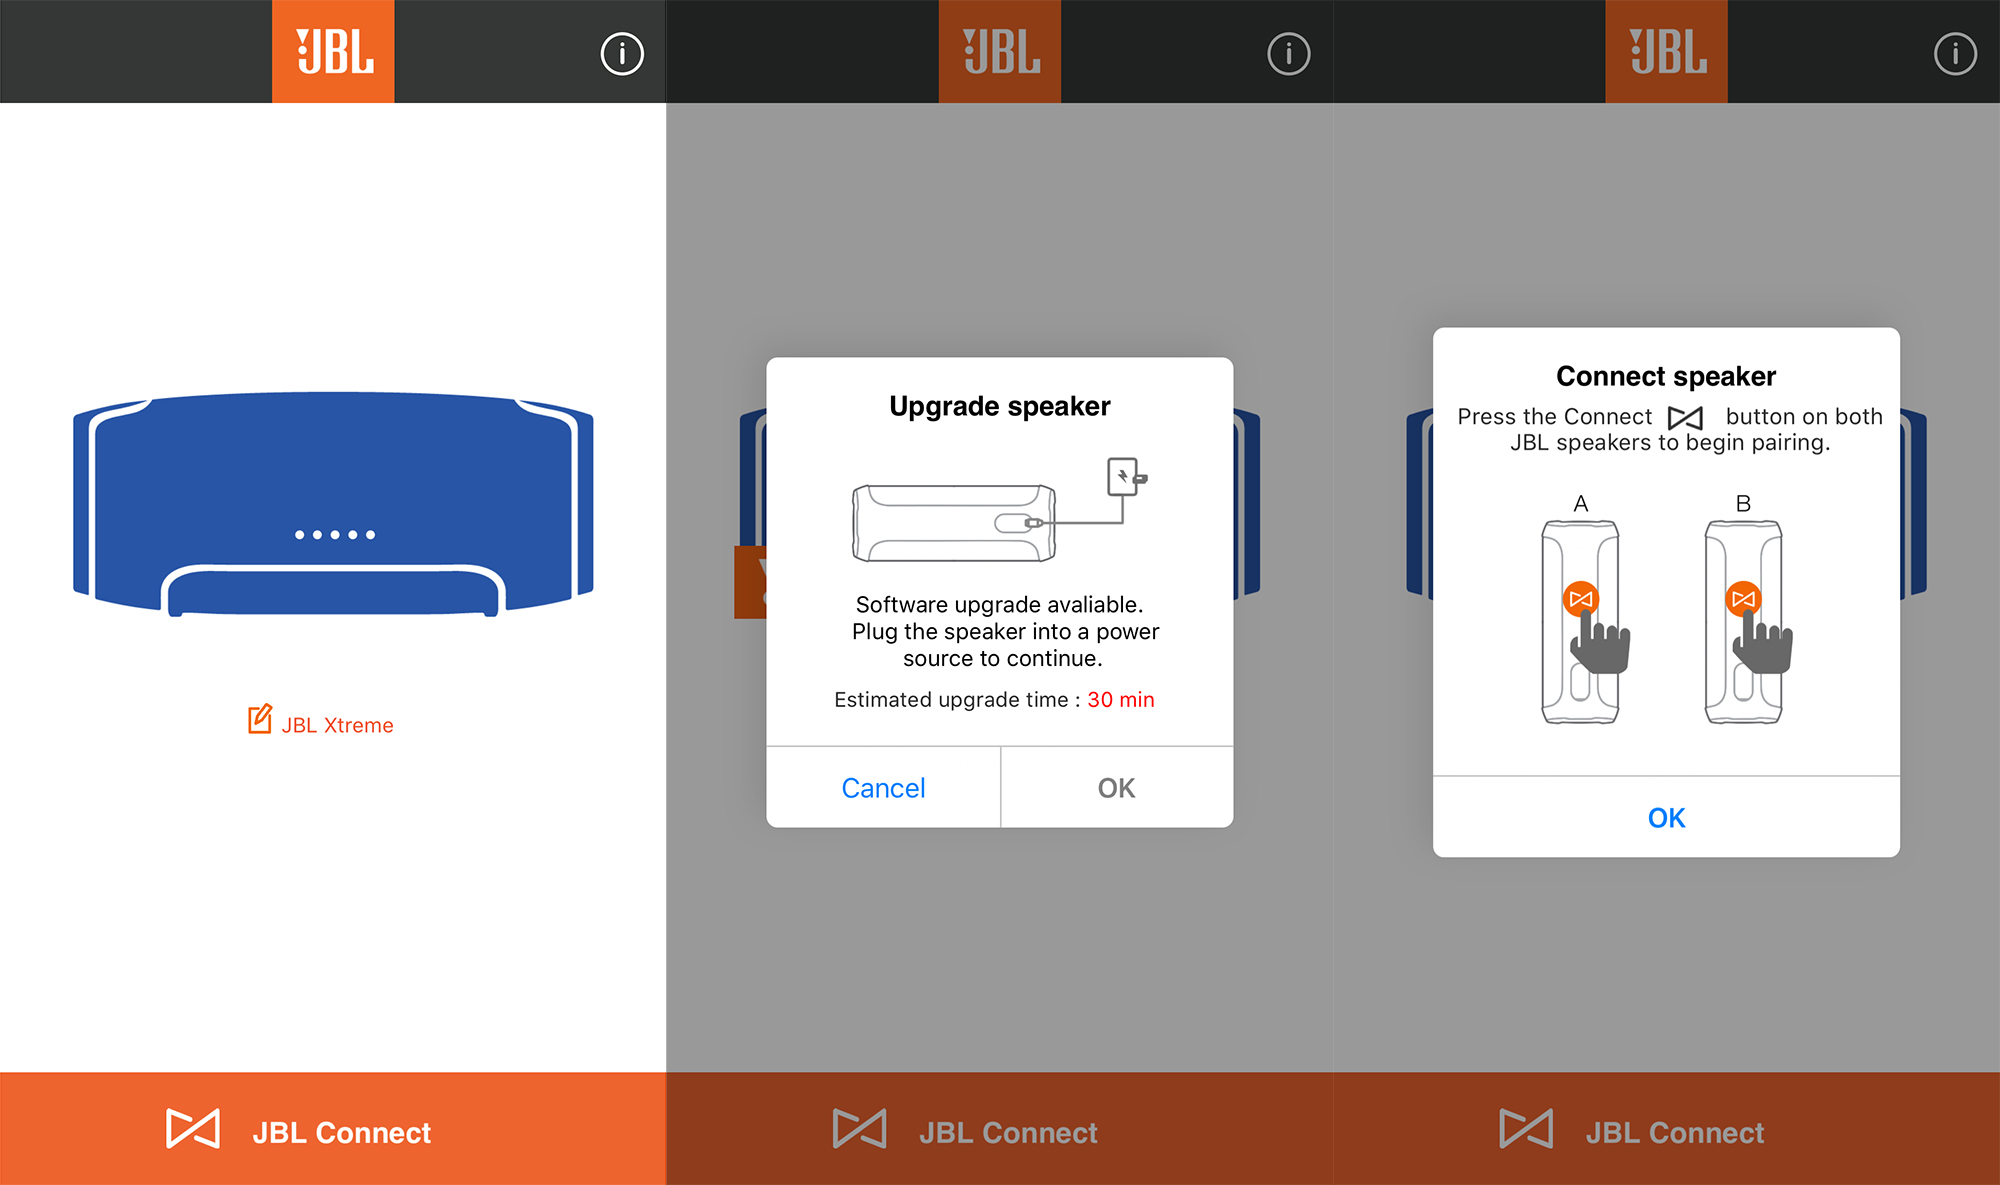 jbl-connect-app.jpg